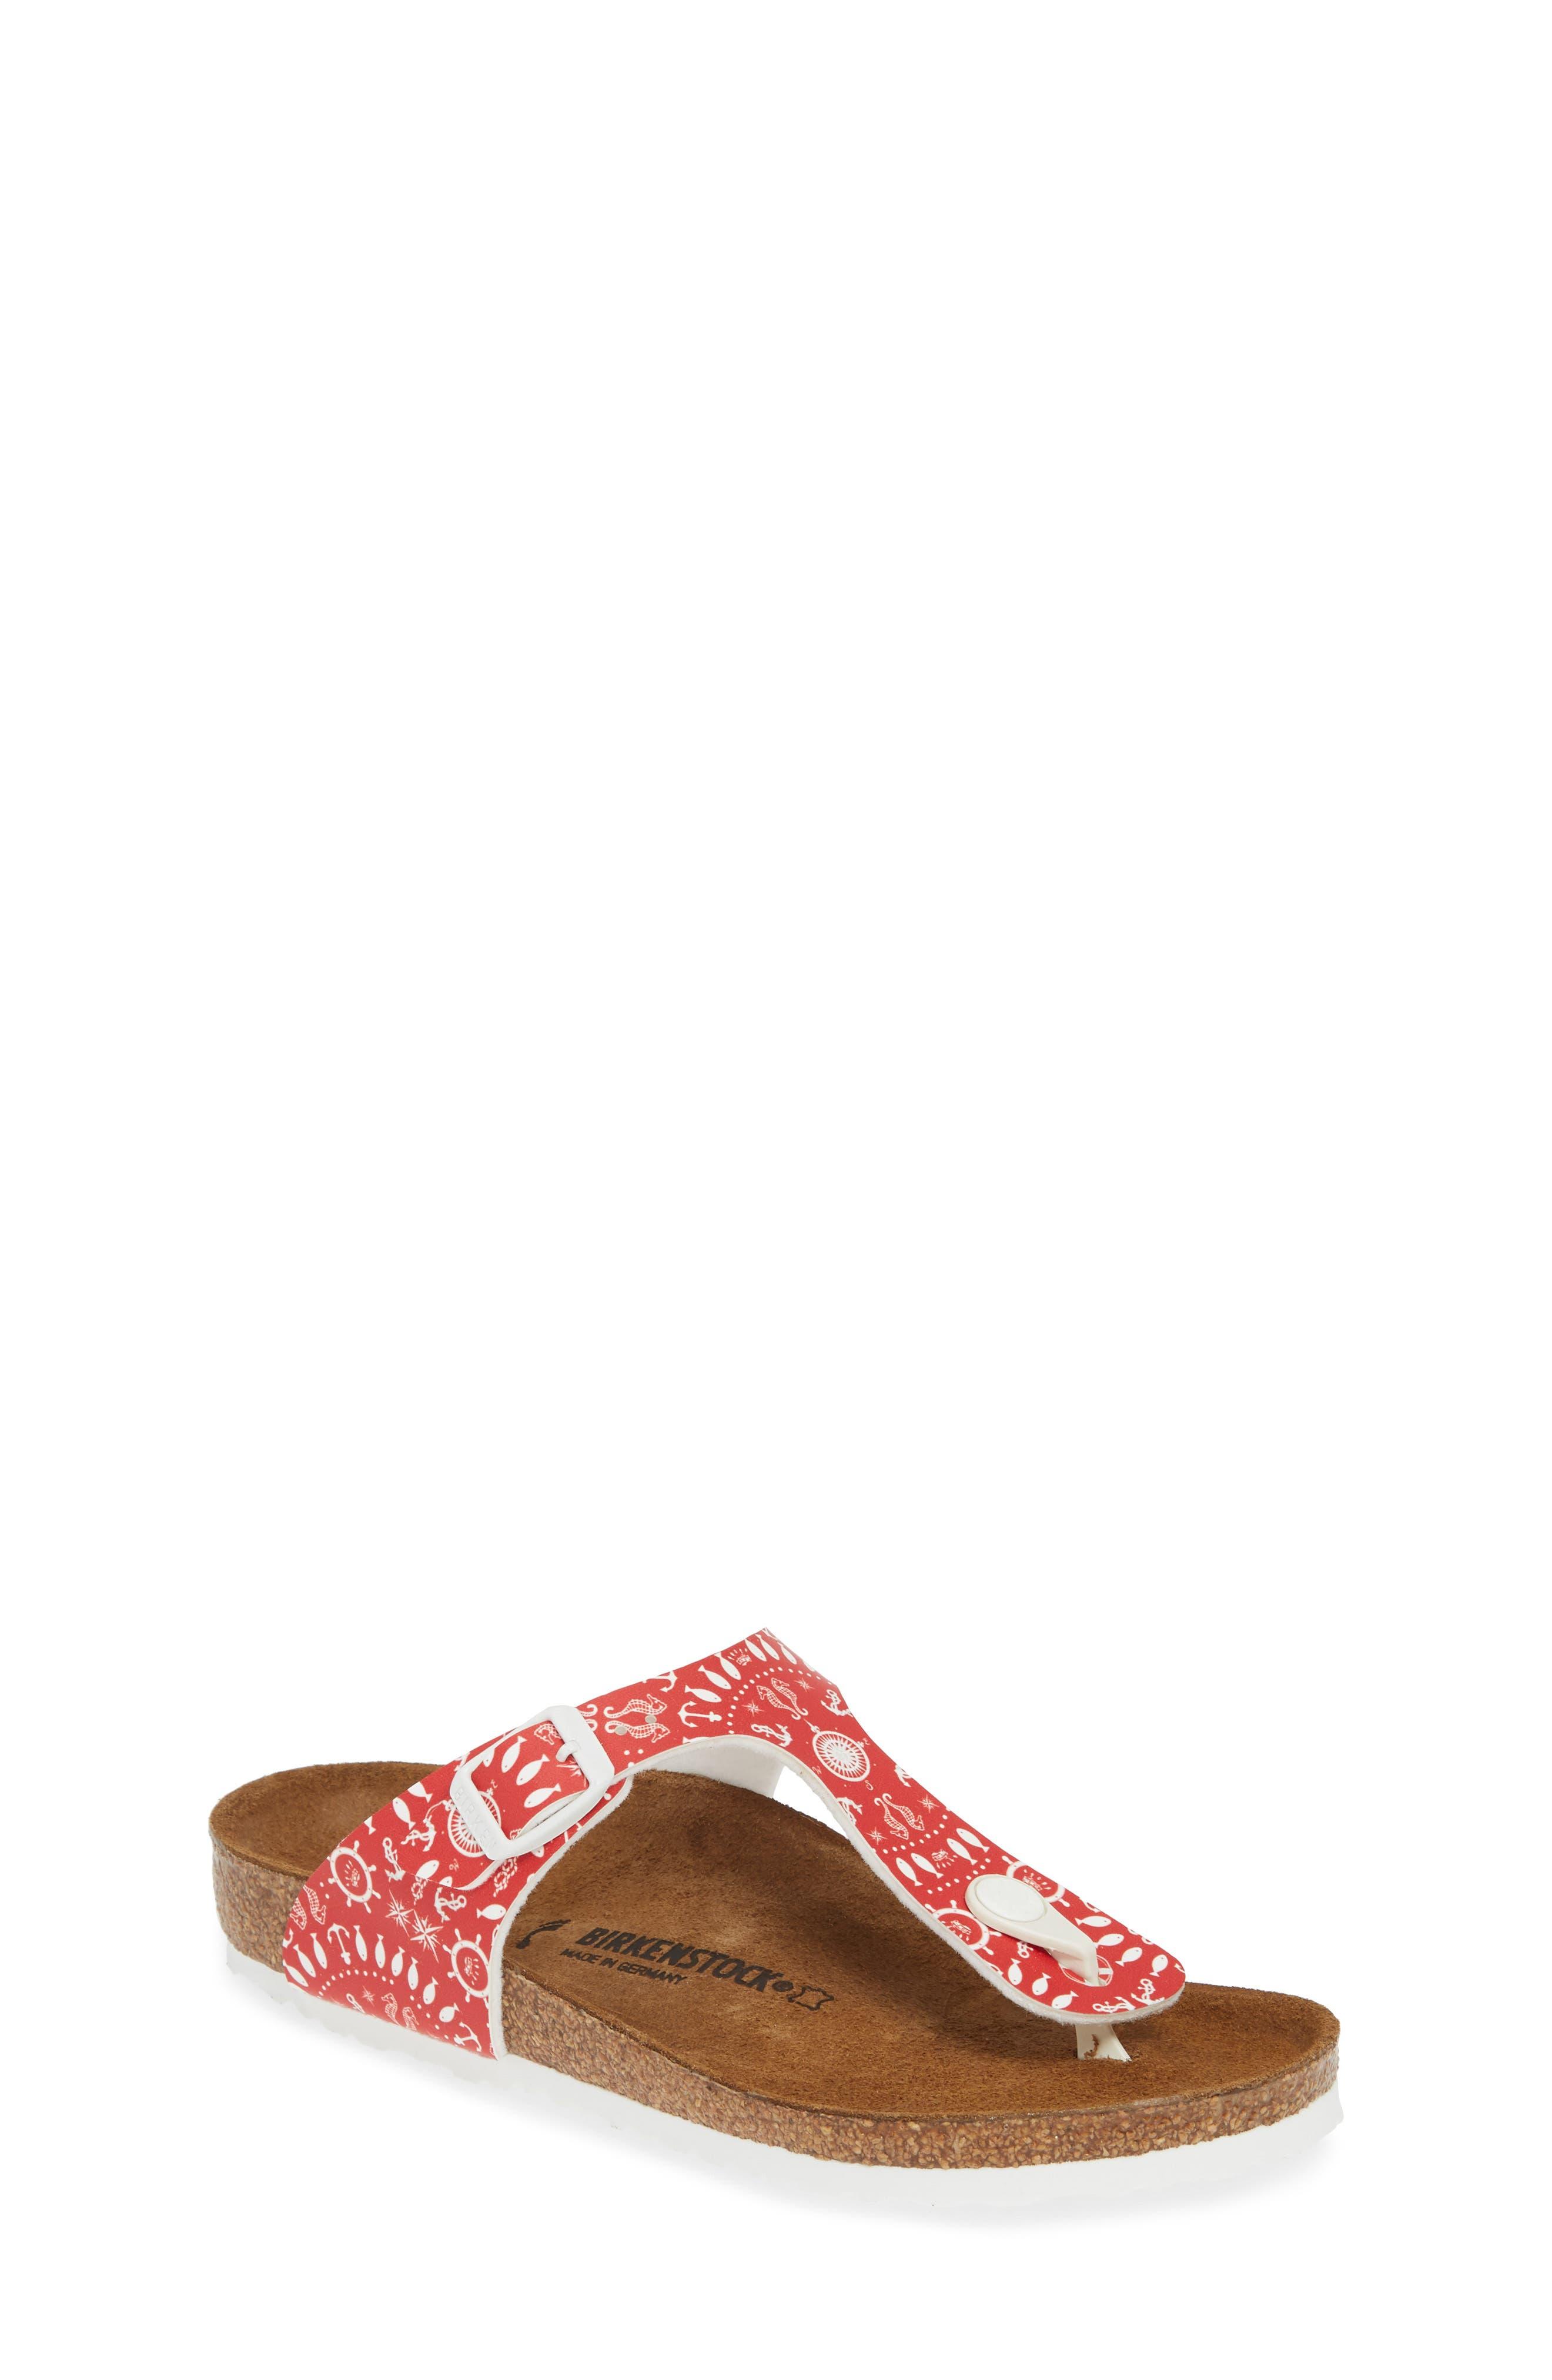 365520badd2a Toddler Girls  Birkenstock Shoes (Sizes 7.5-12)